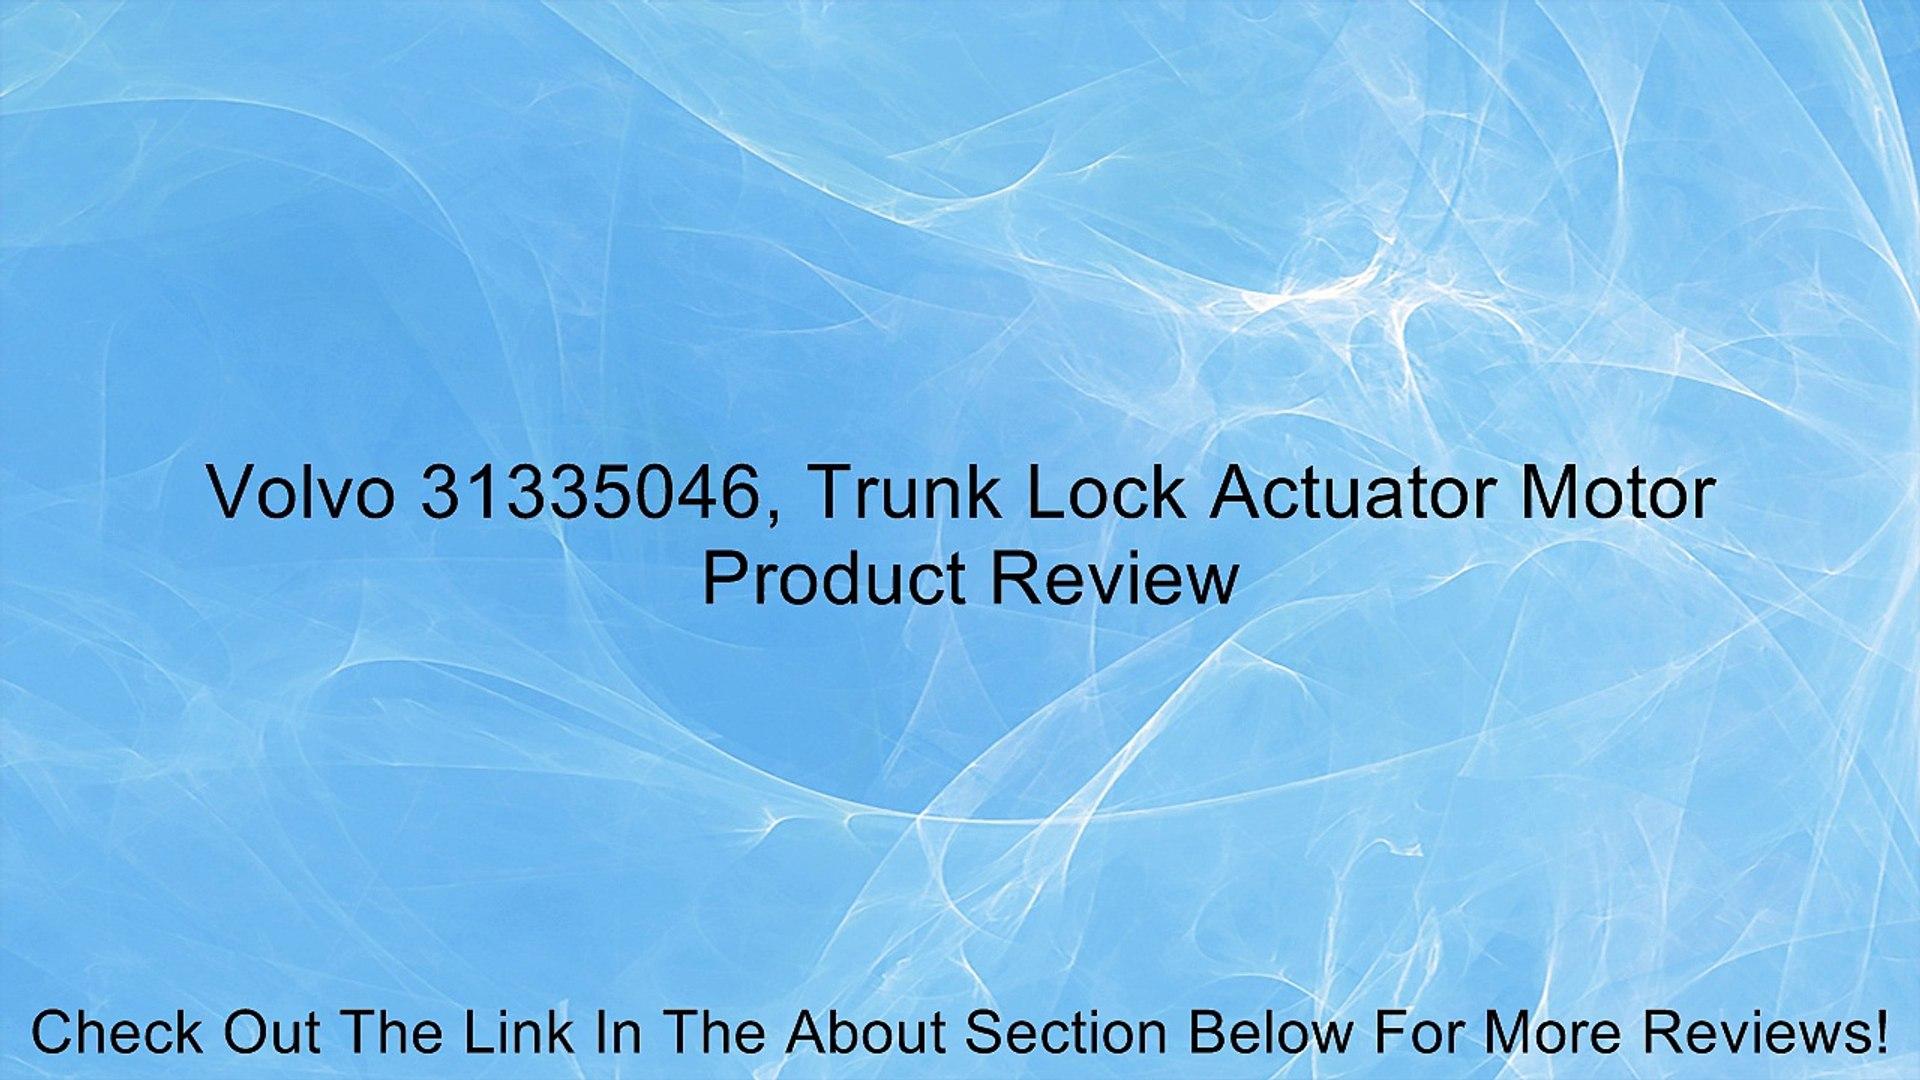 Toyota 69690-35030 Trunk Lock Actuator Motor